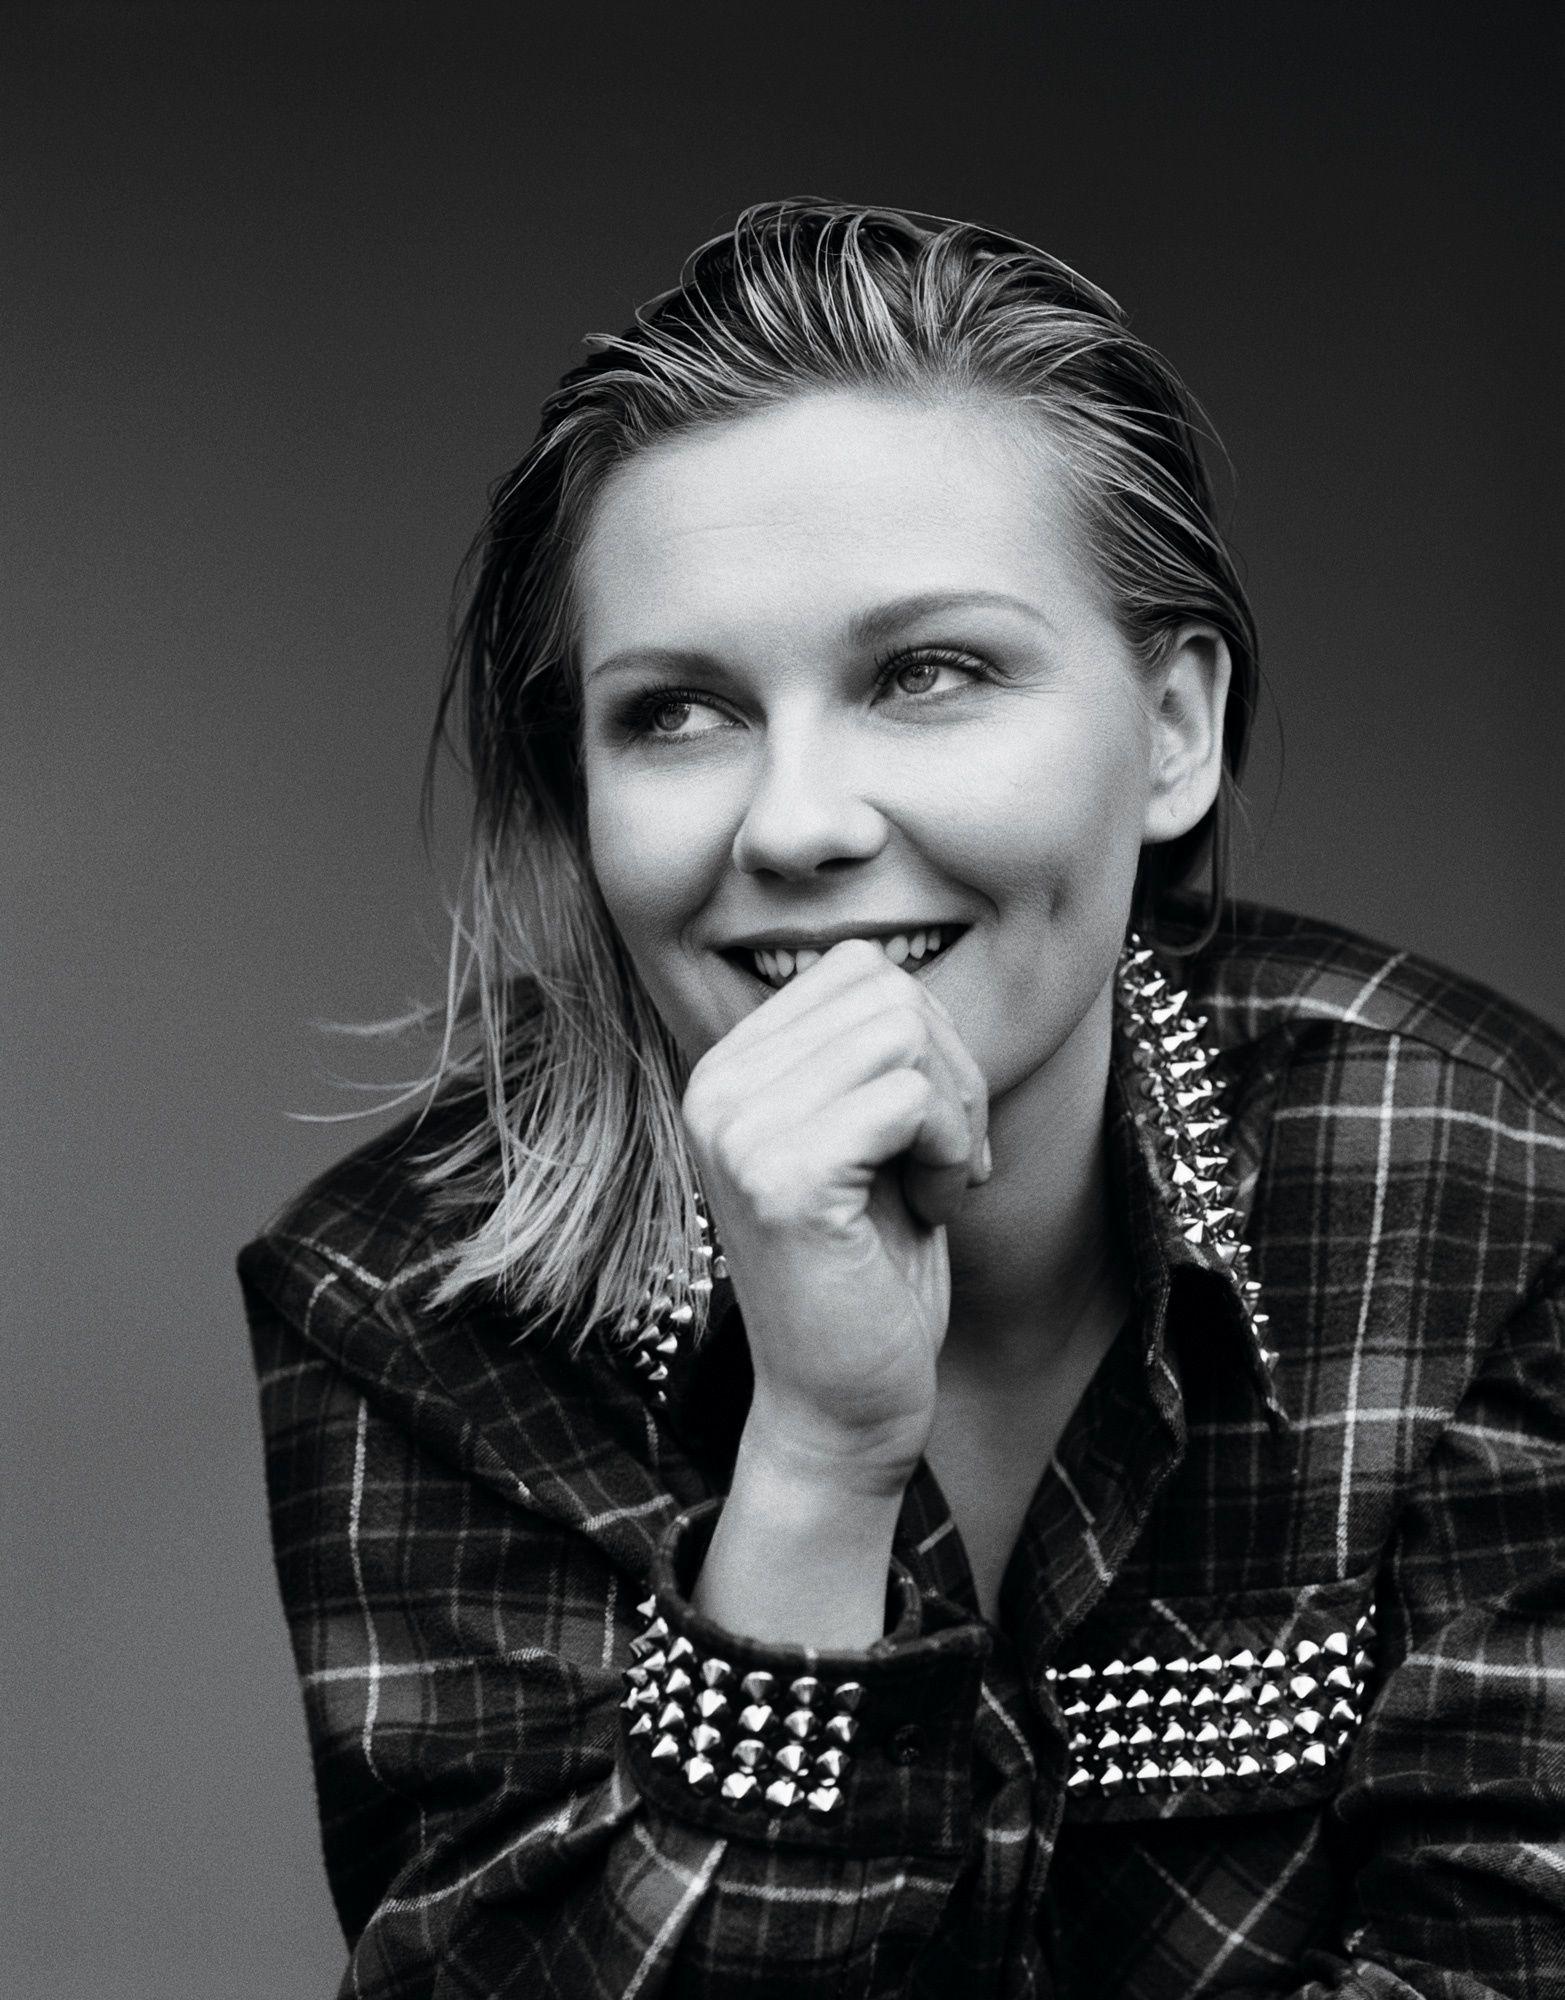 Black and white portrait of Kirsten Dunst.